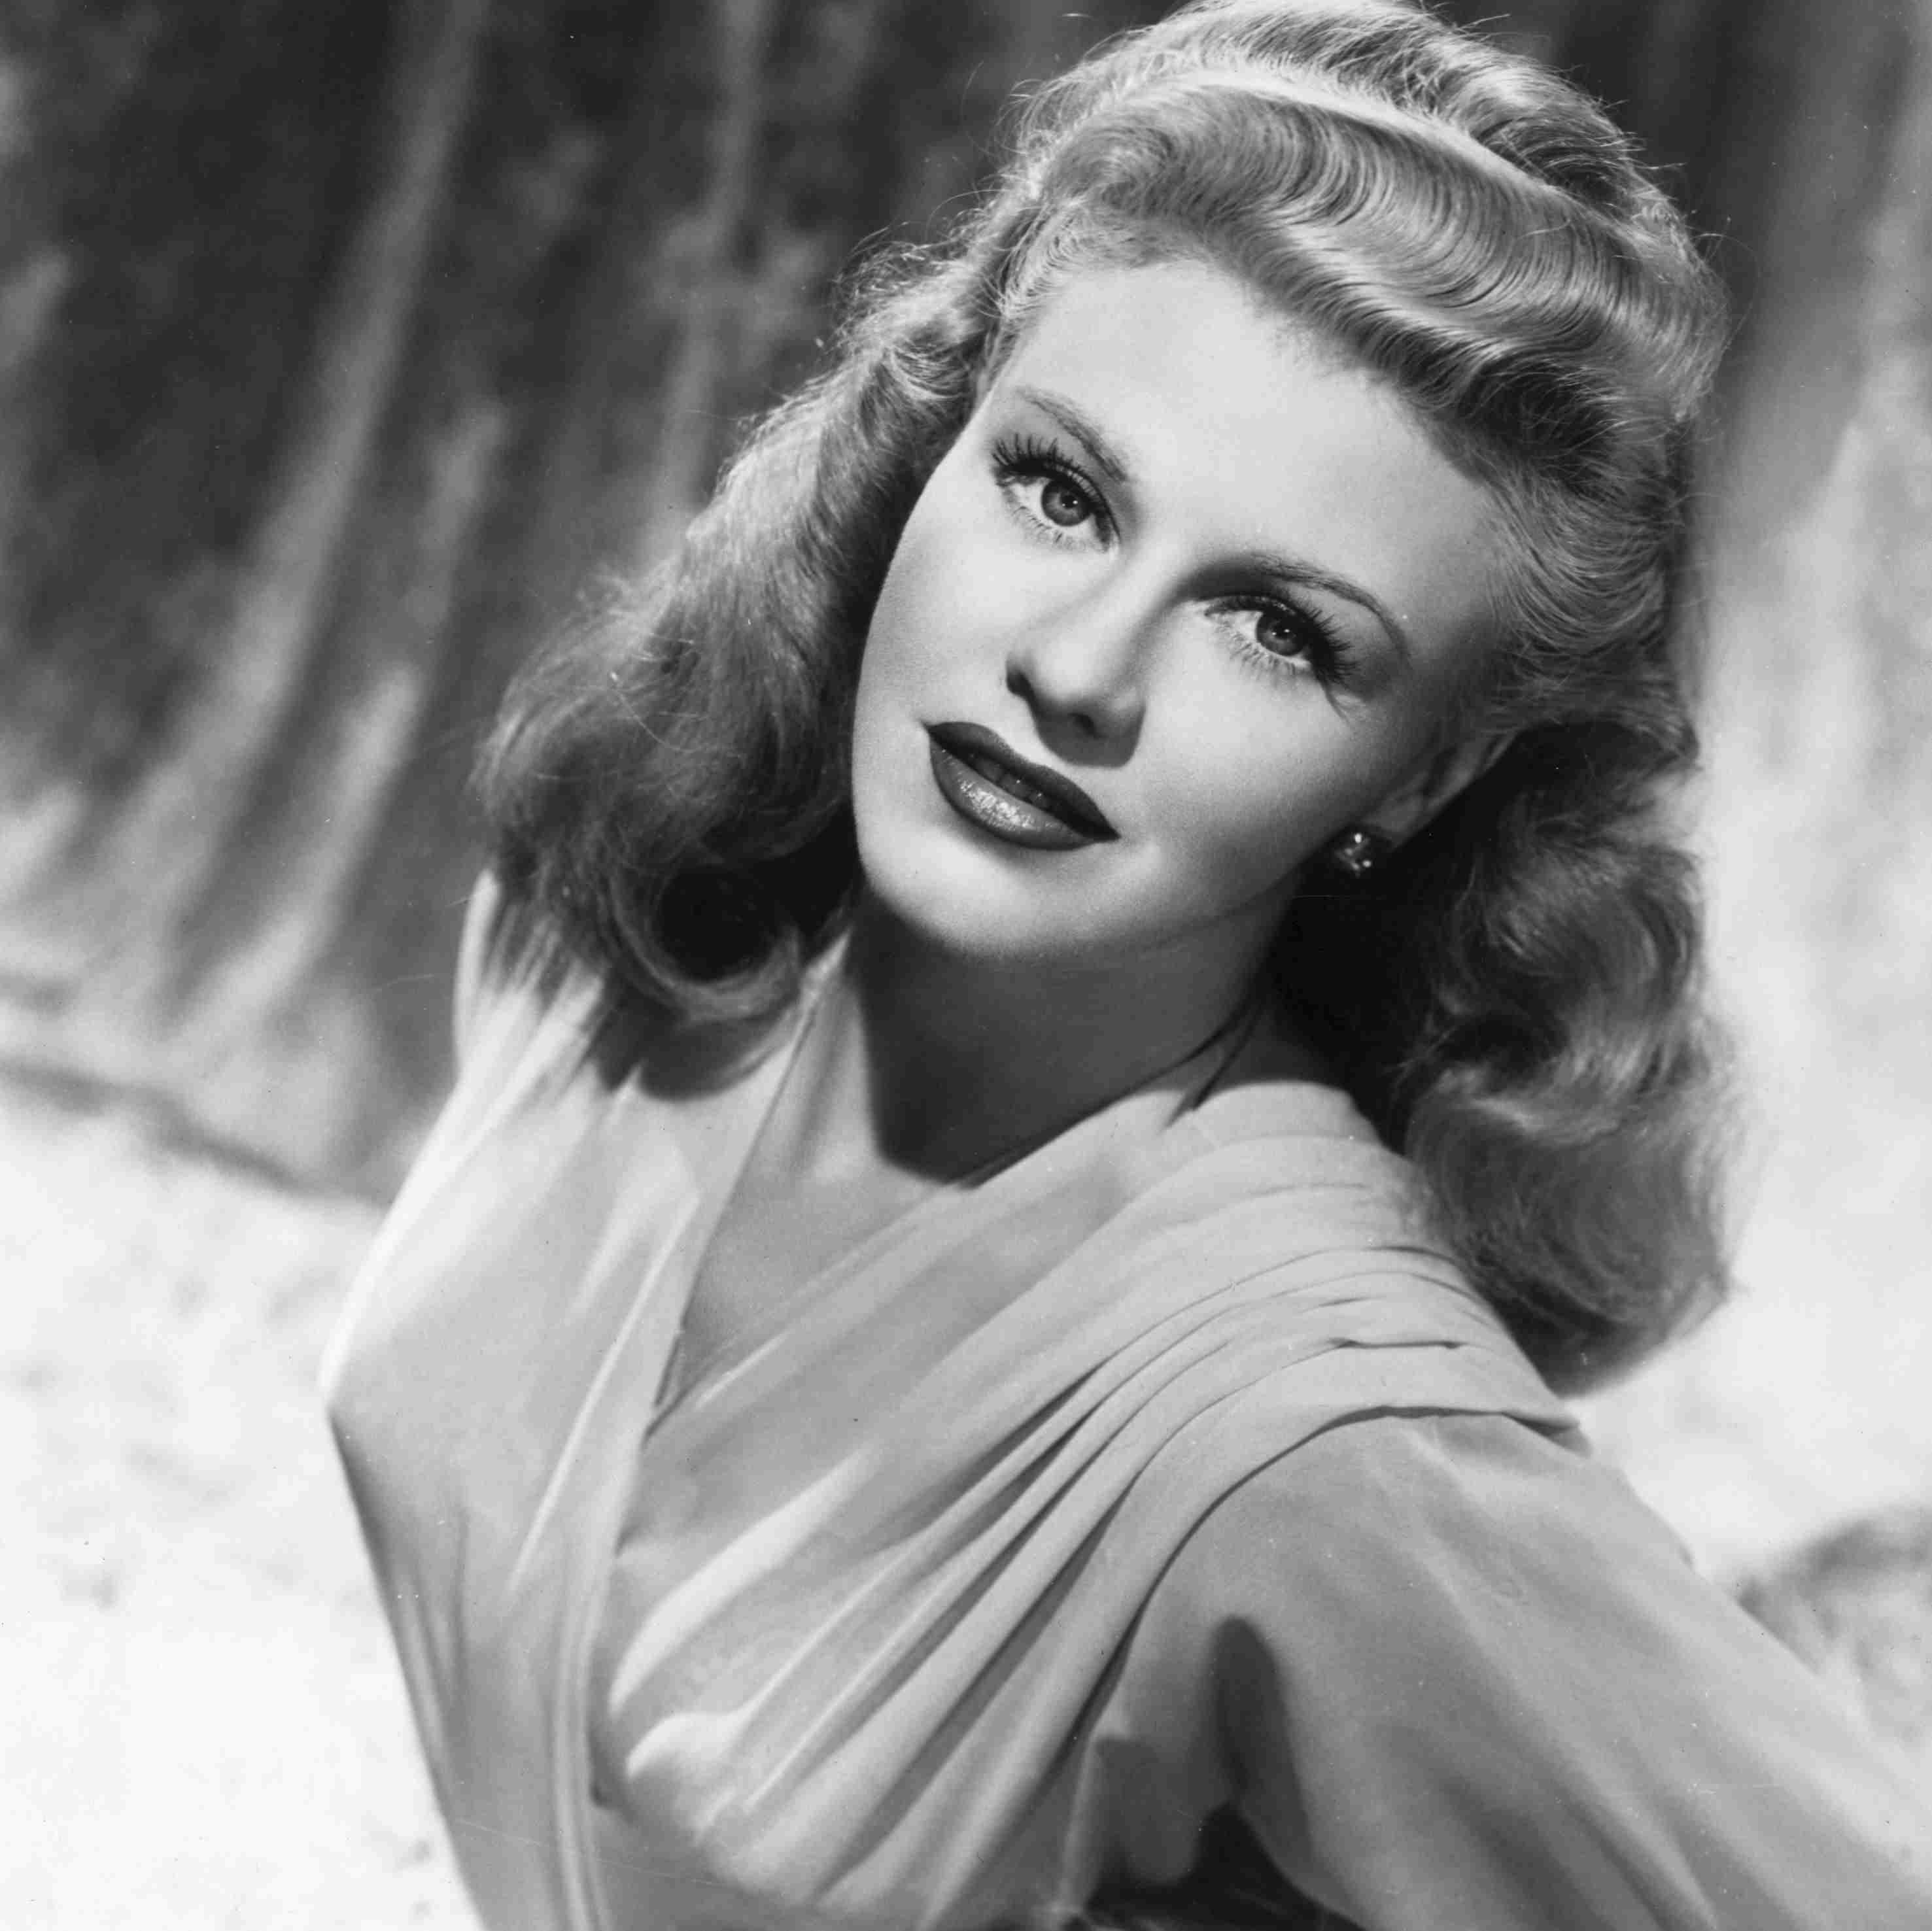 Famous dancer Ginger Rogers